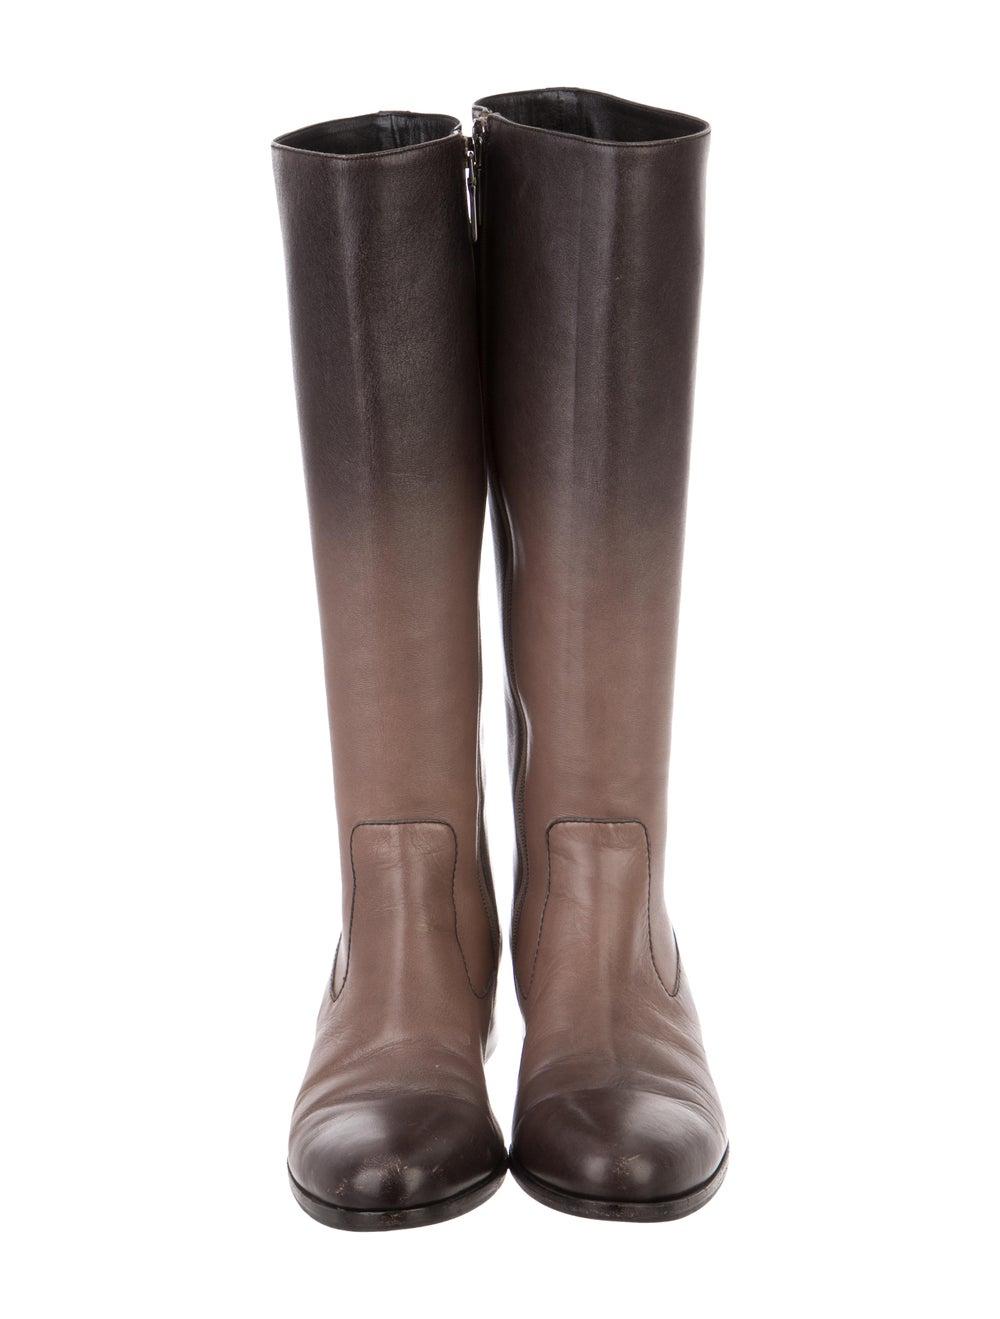 Prada Leather Knee-High Boots Brown - image 3